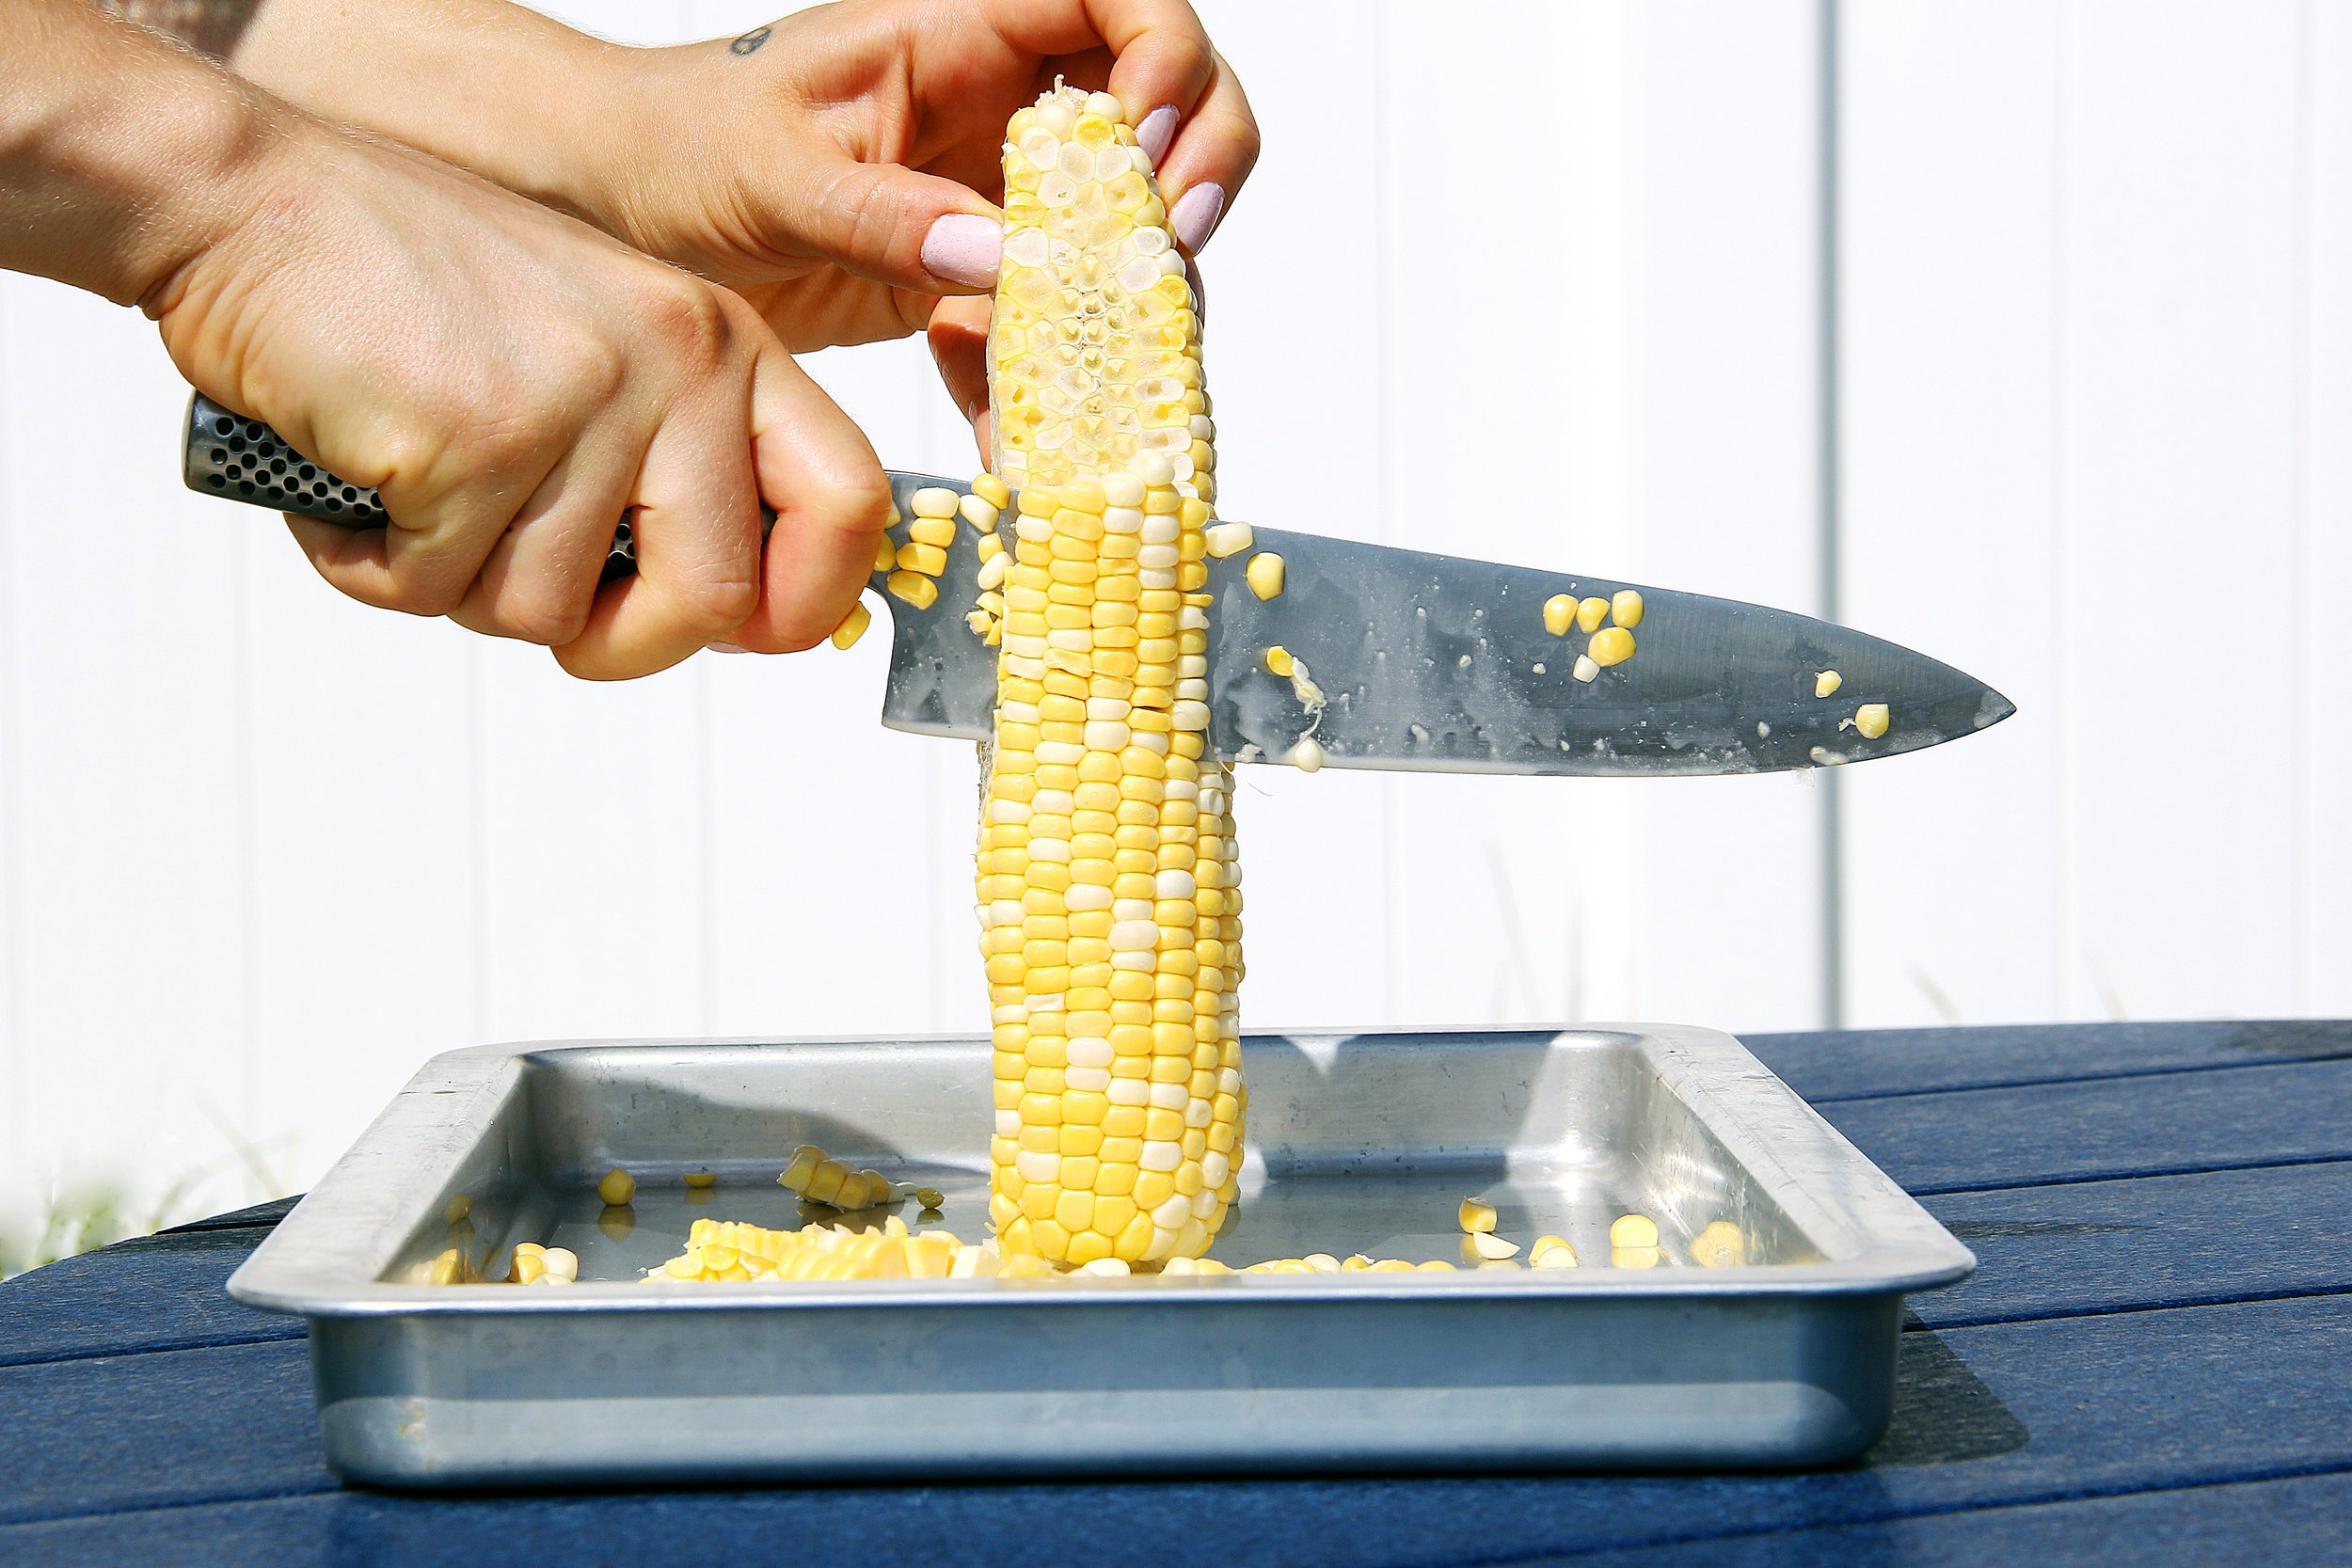 cornshearing